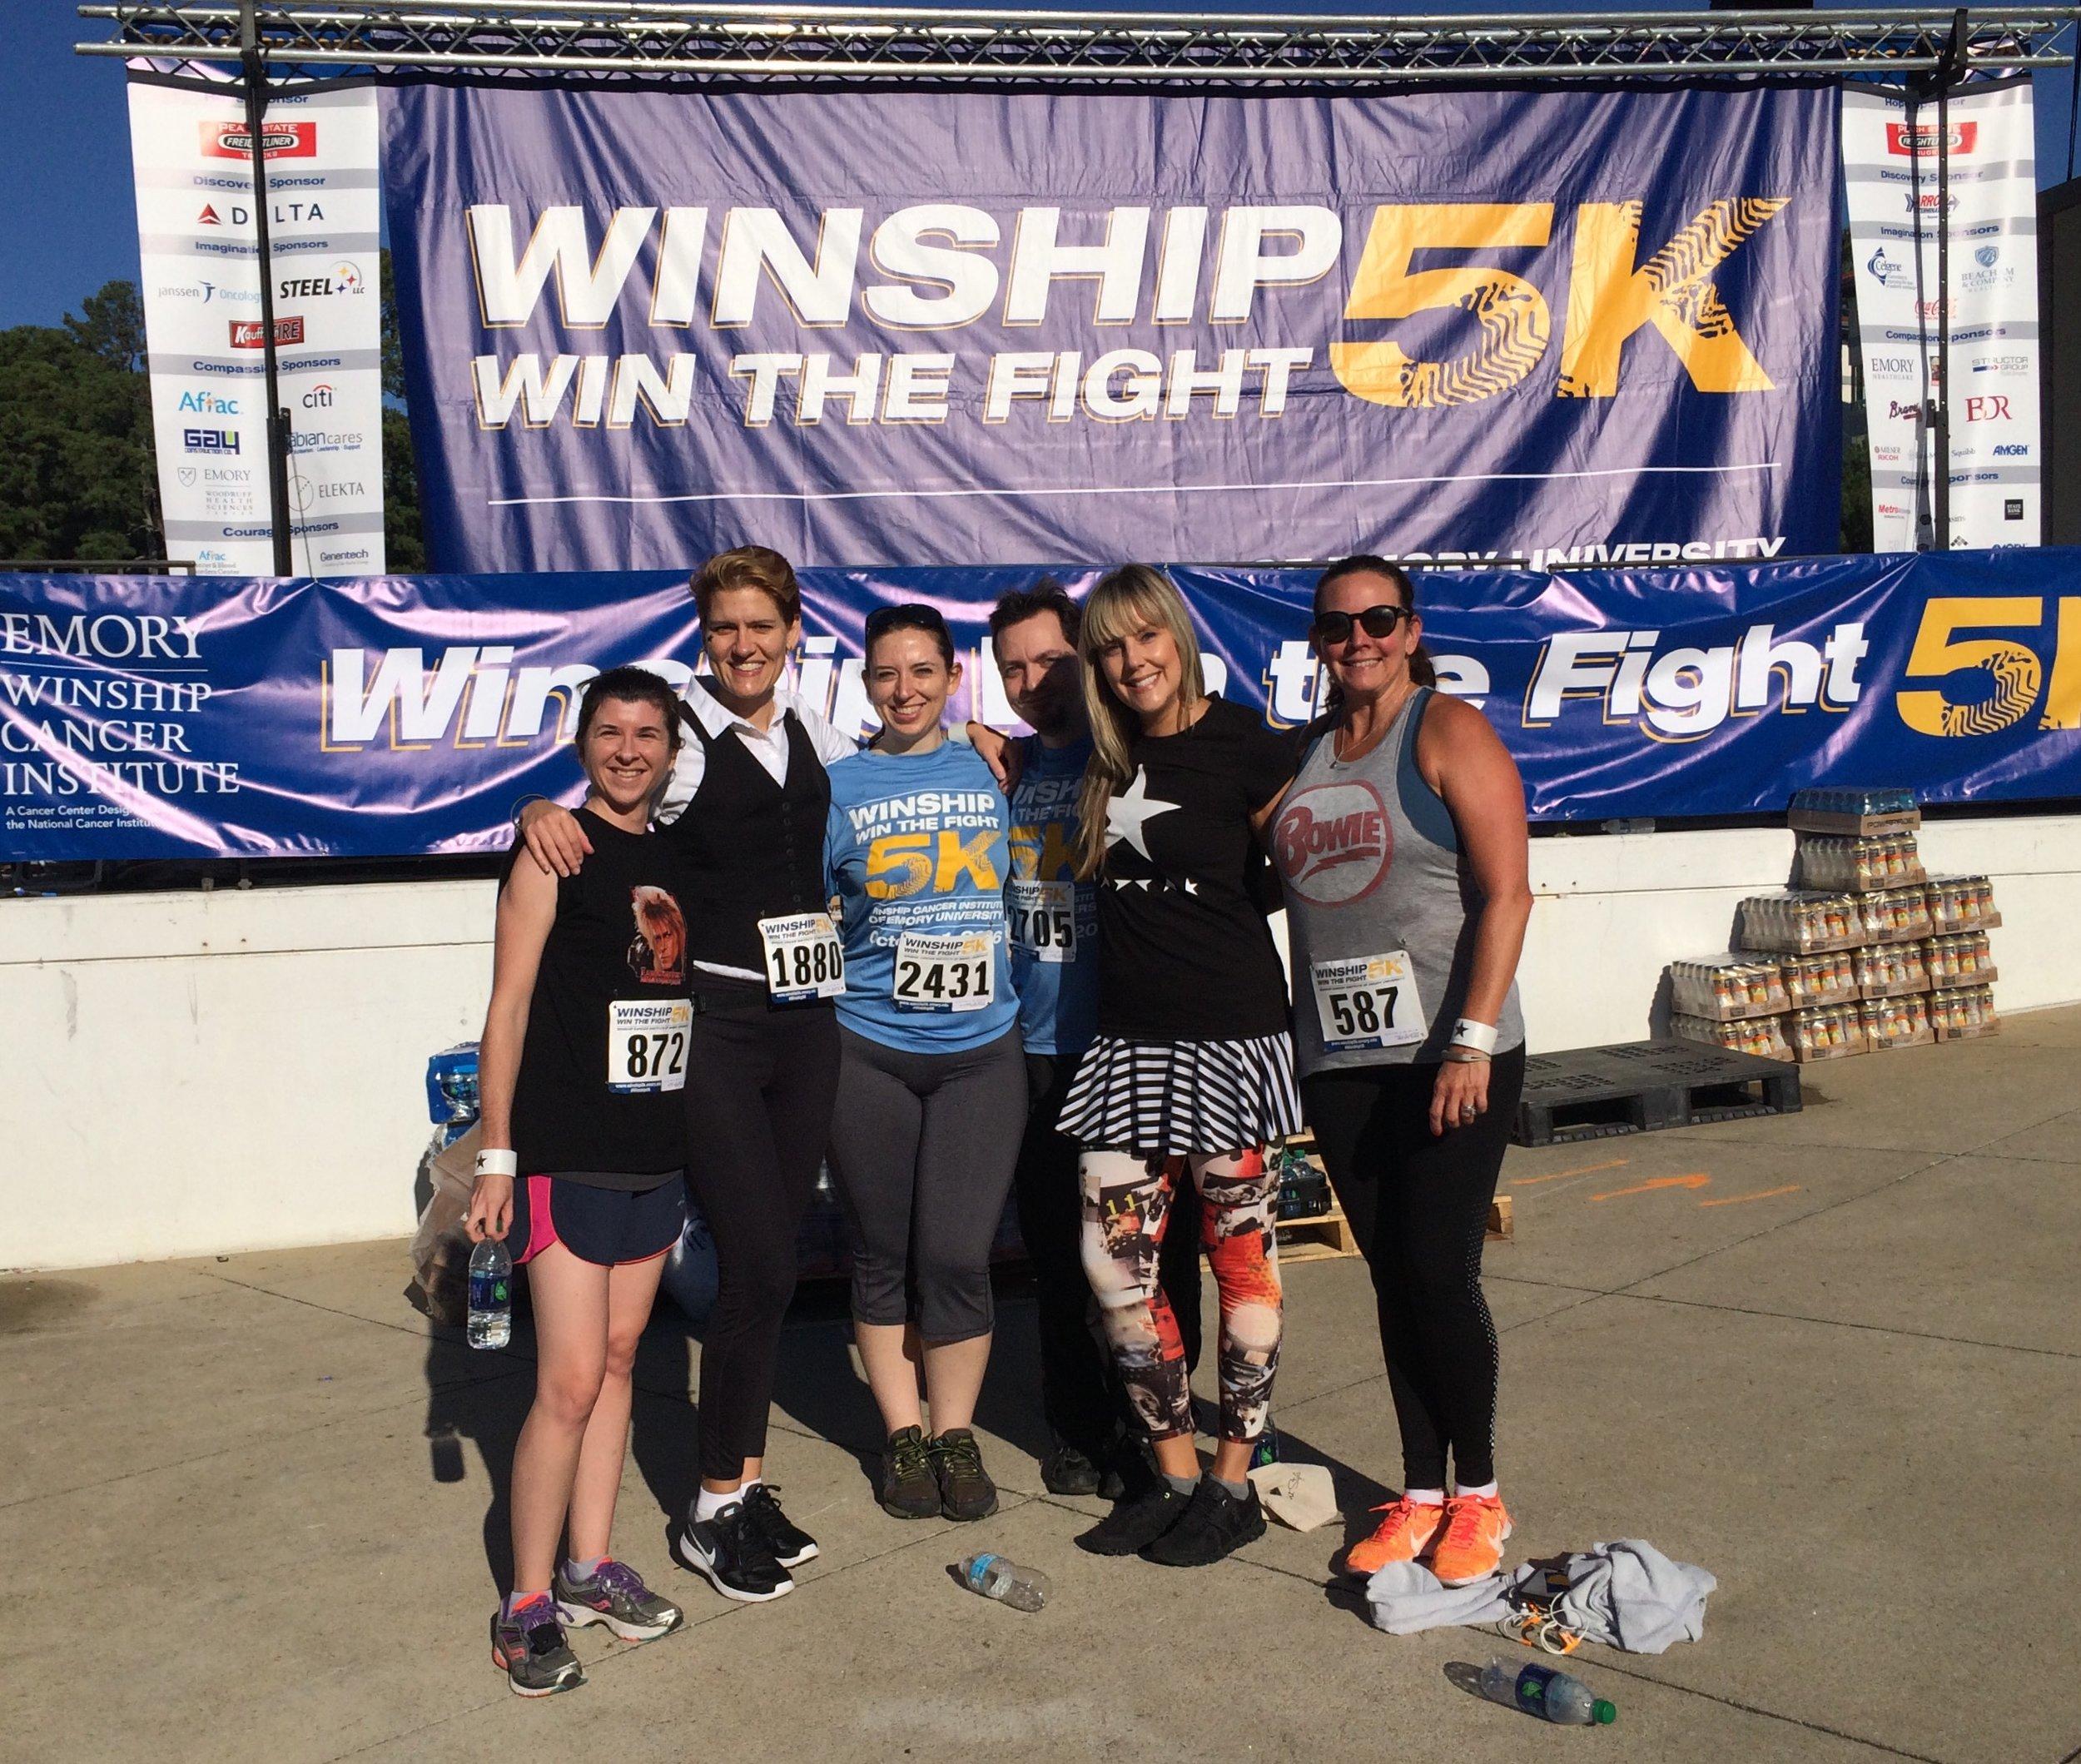 Winship Cancer Institute 5K Team